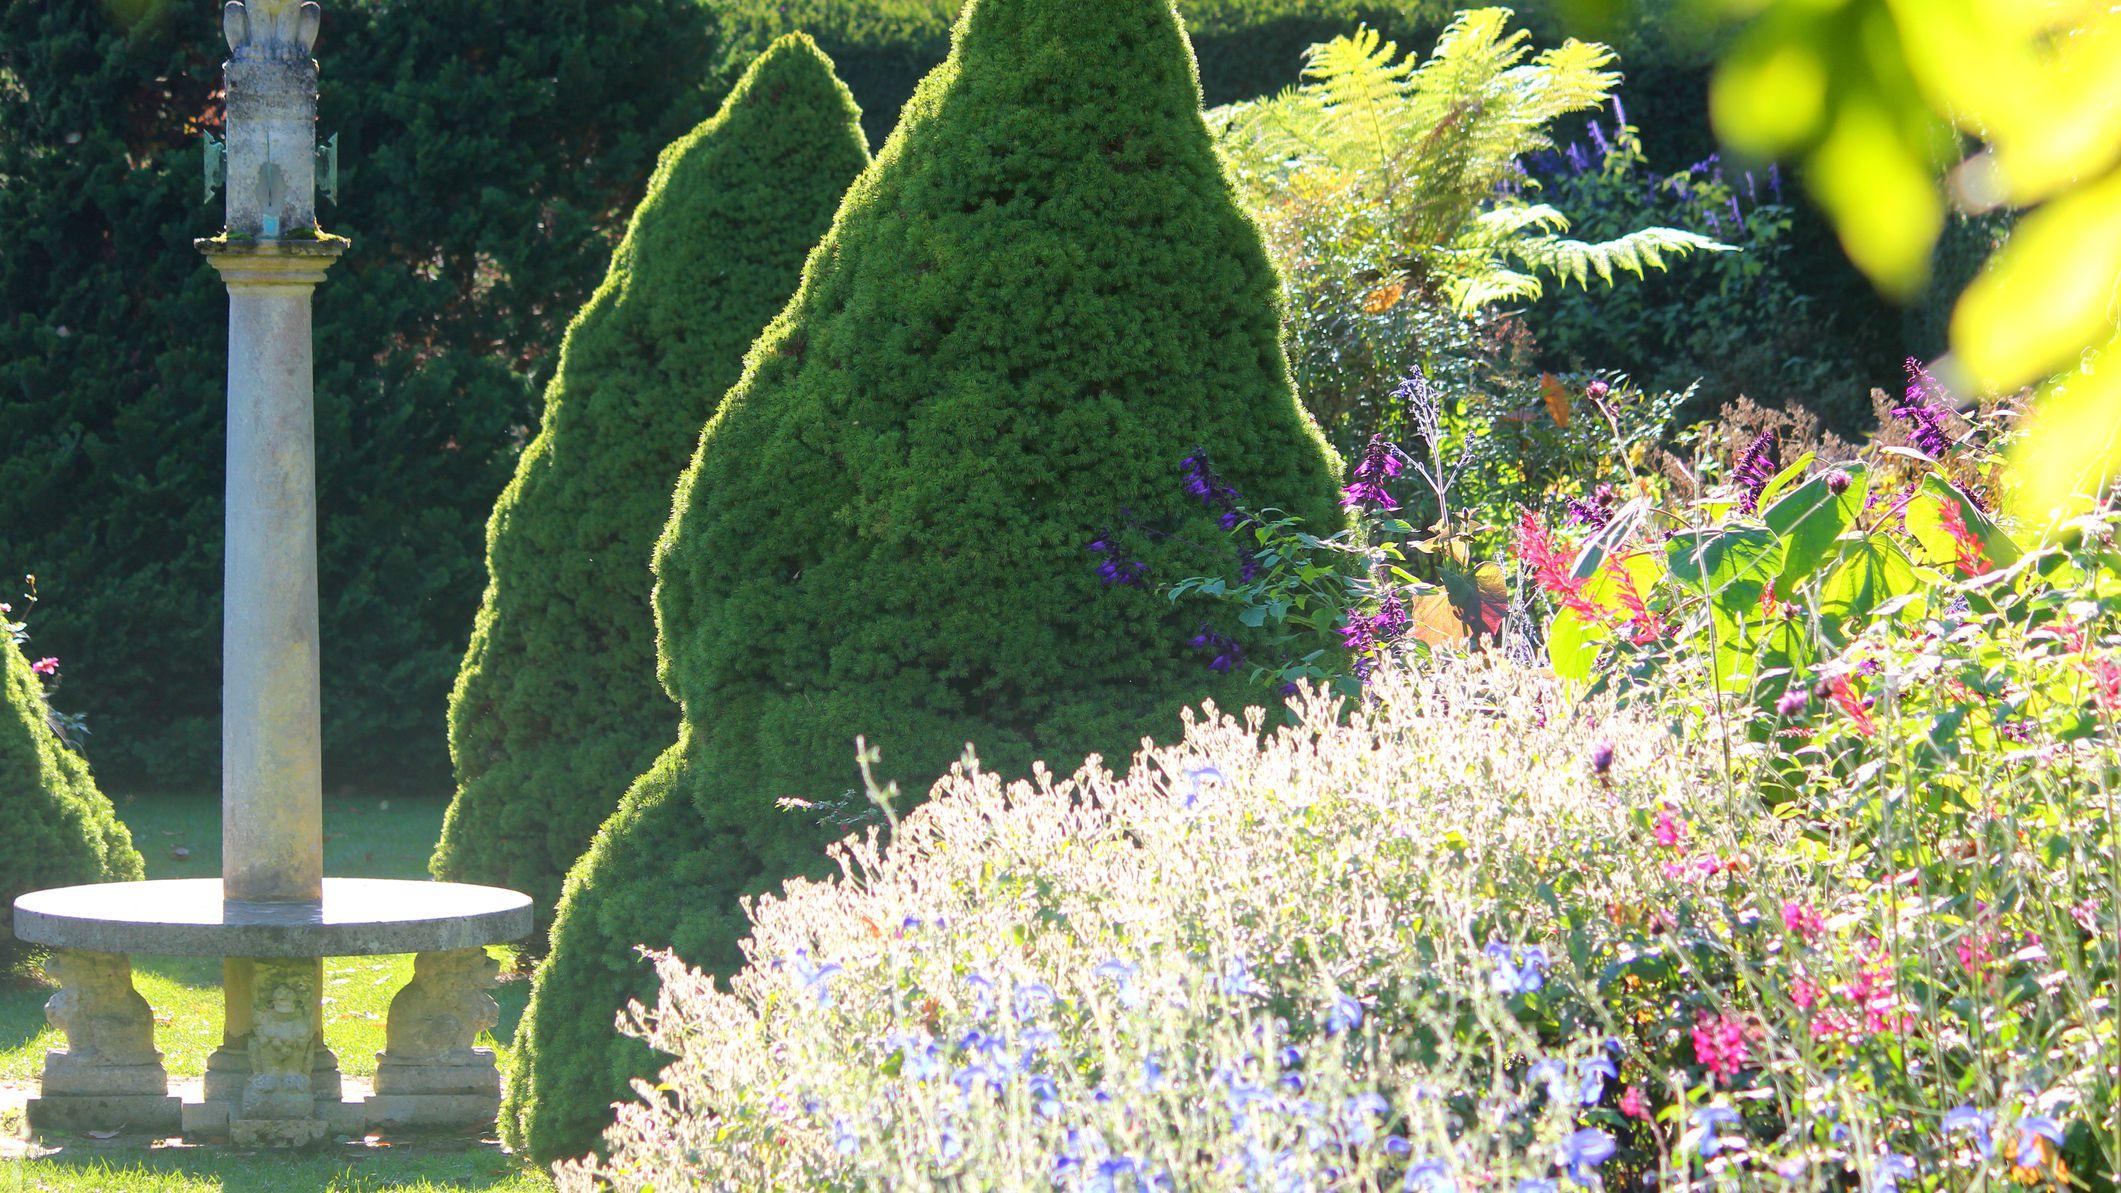 How To Grow Dwarf Alberta Spruce In A Pot